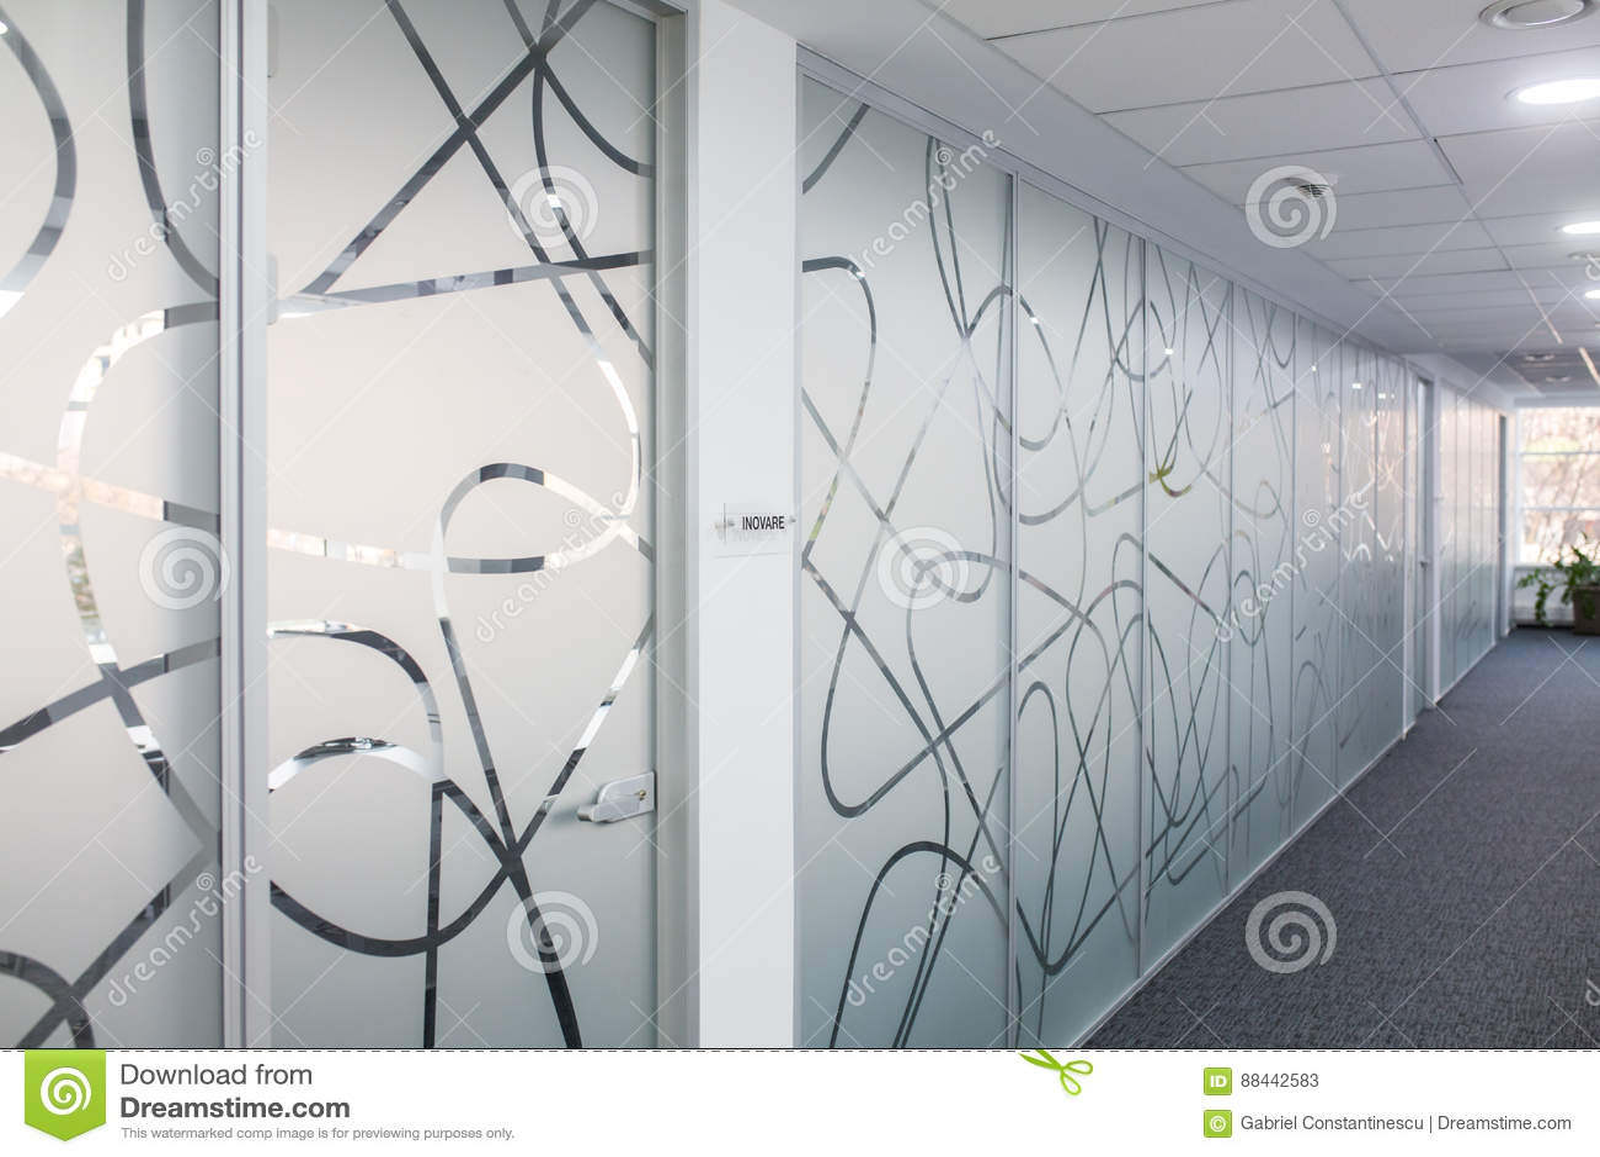 Hallway in office building